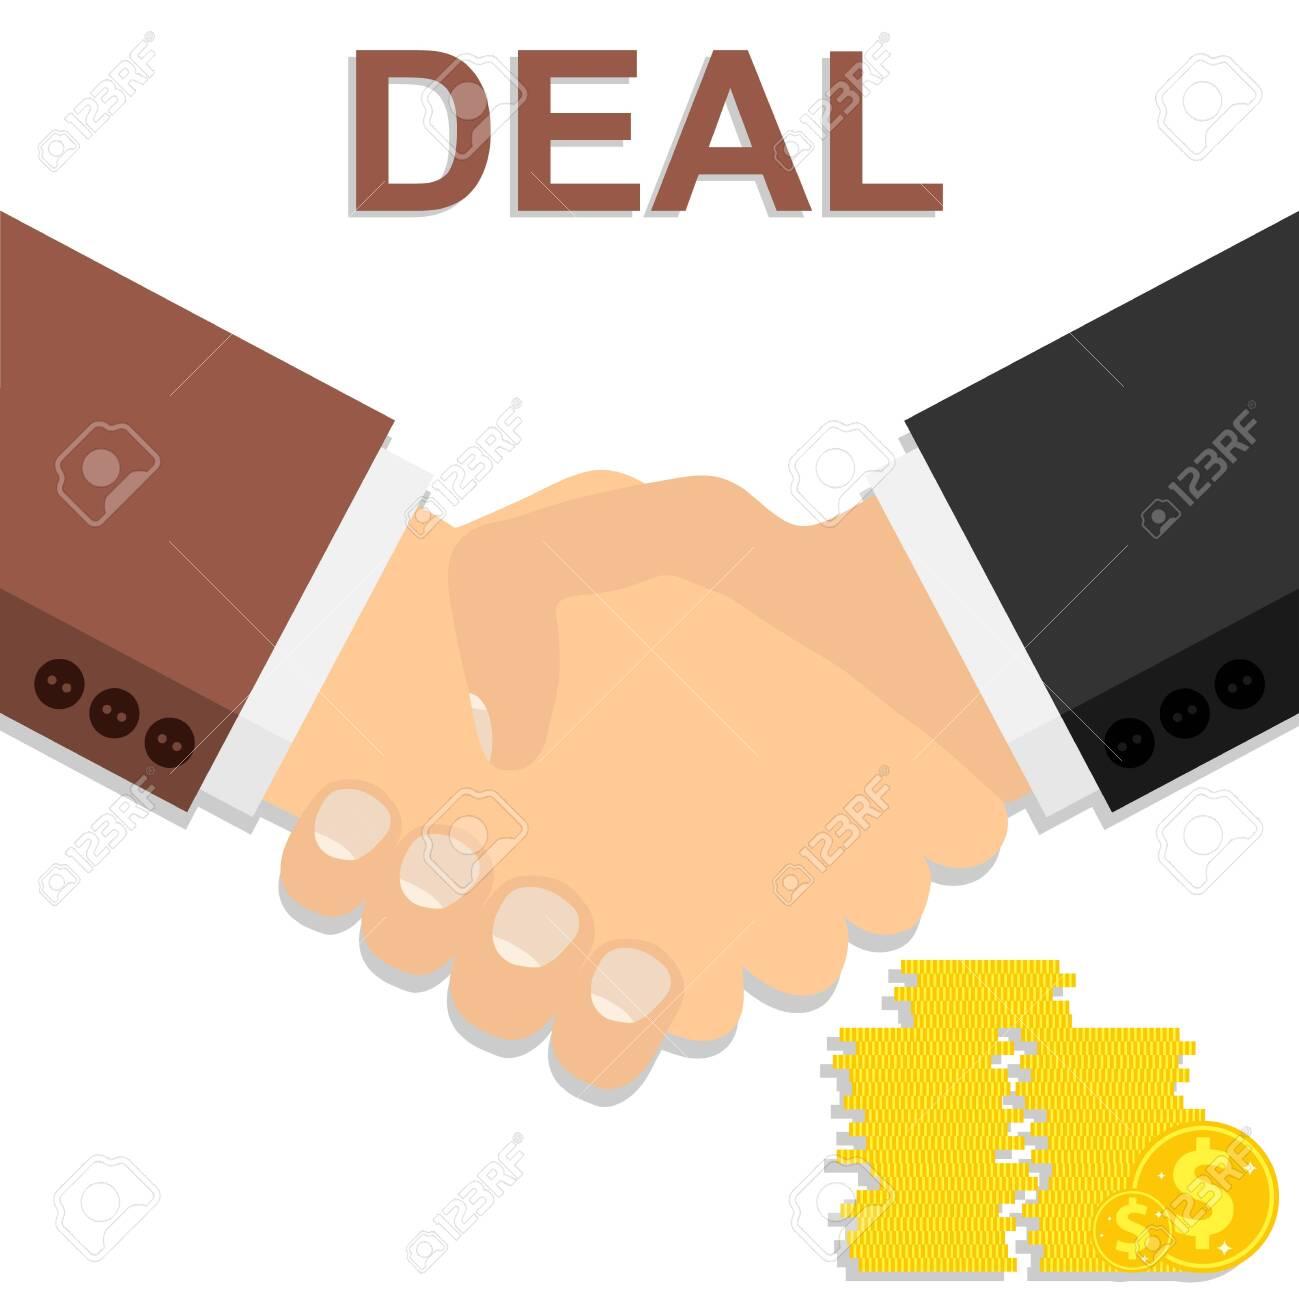 Handshake. Deal. Two businessmen shake hands after closing a deal. Vector illustration. Vector. - 150868538